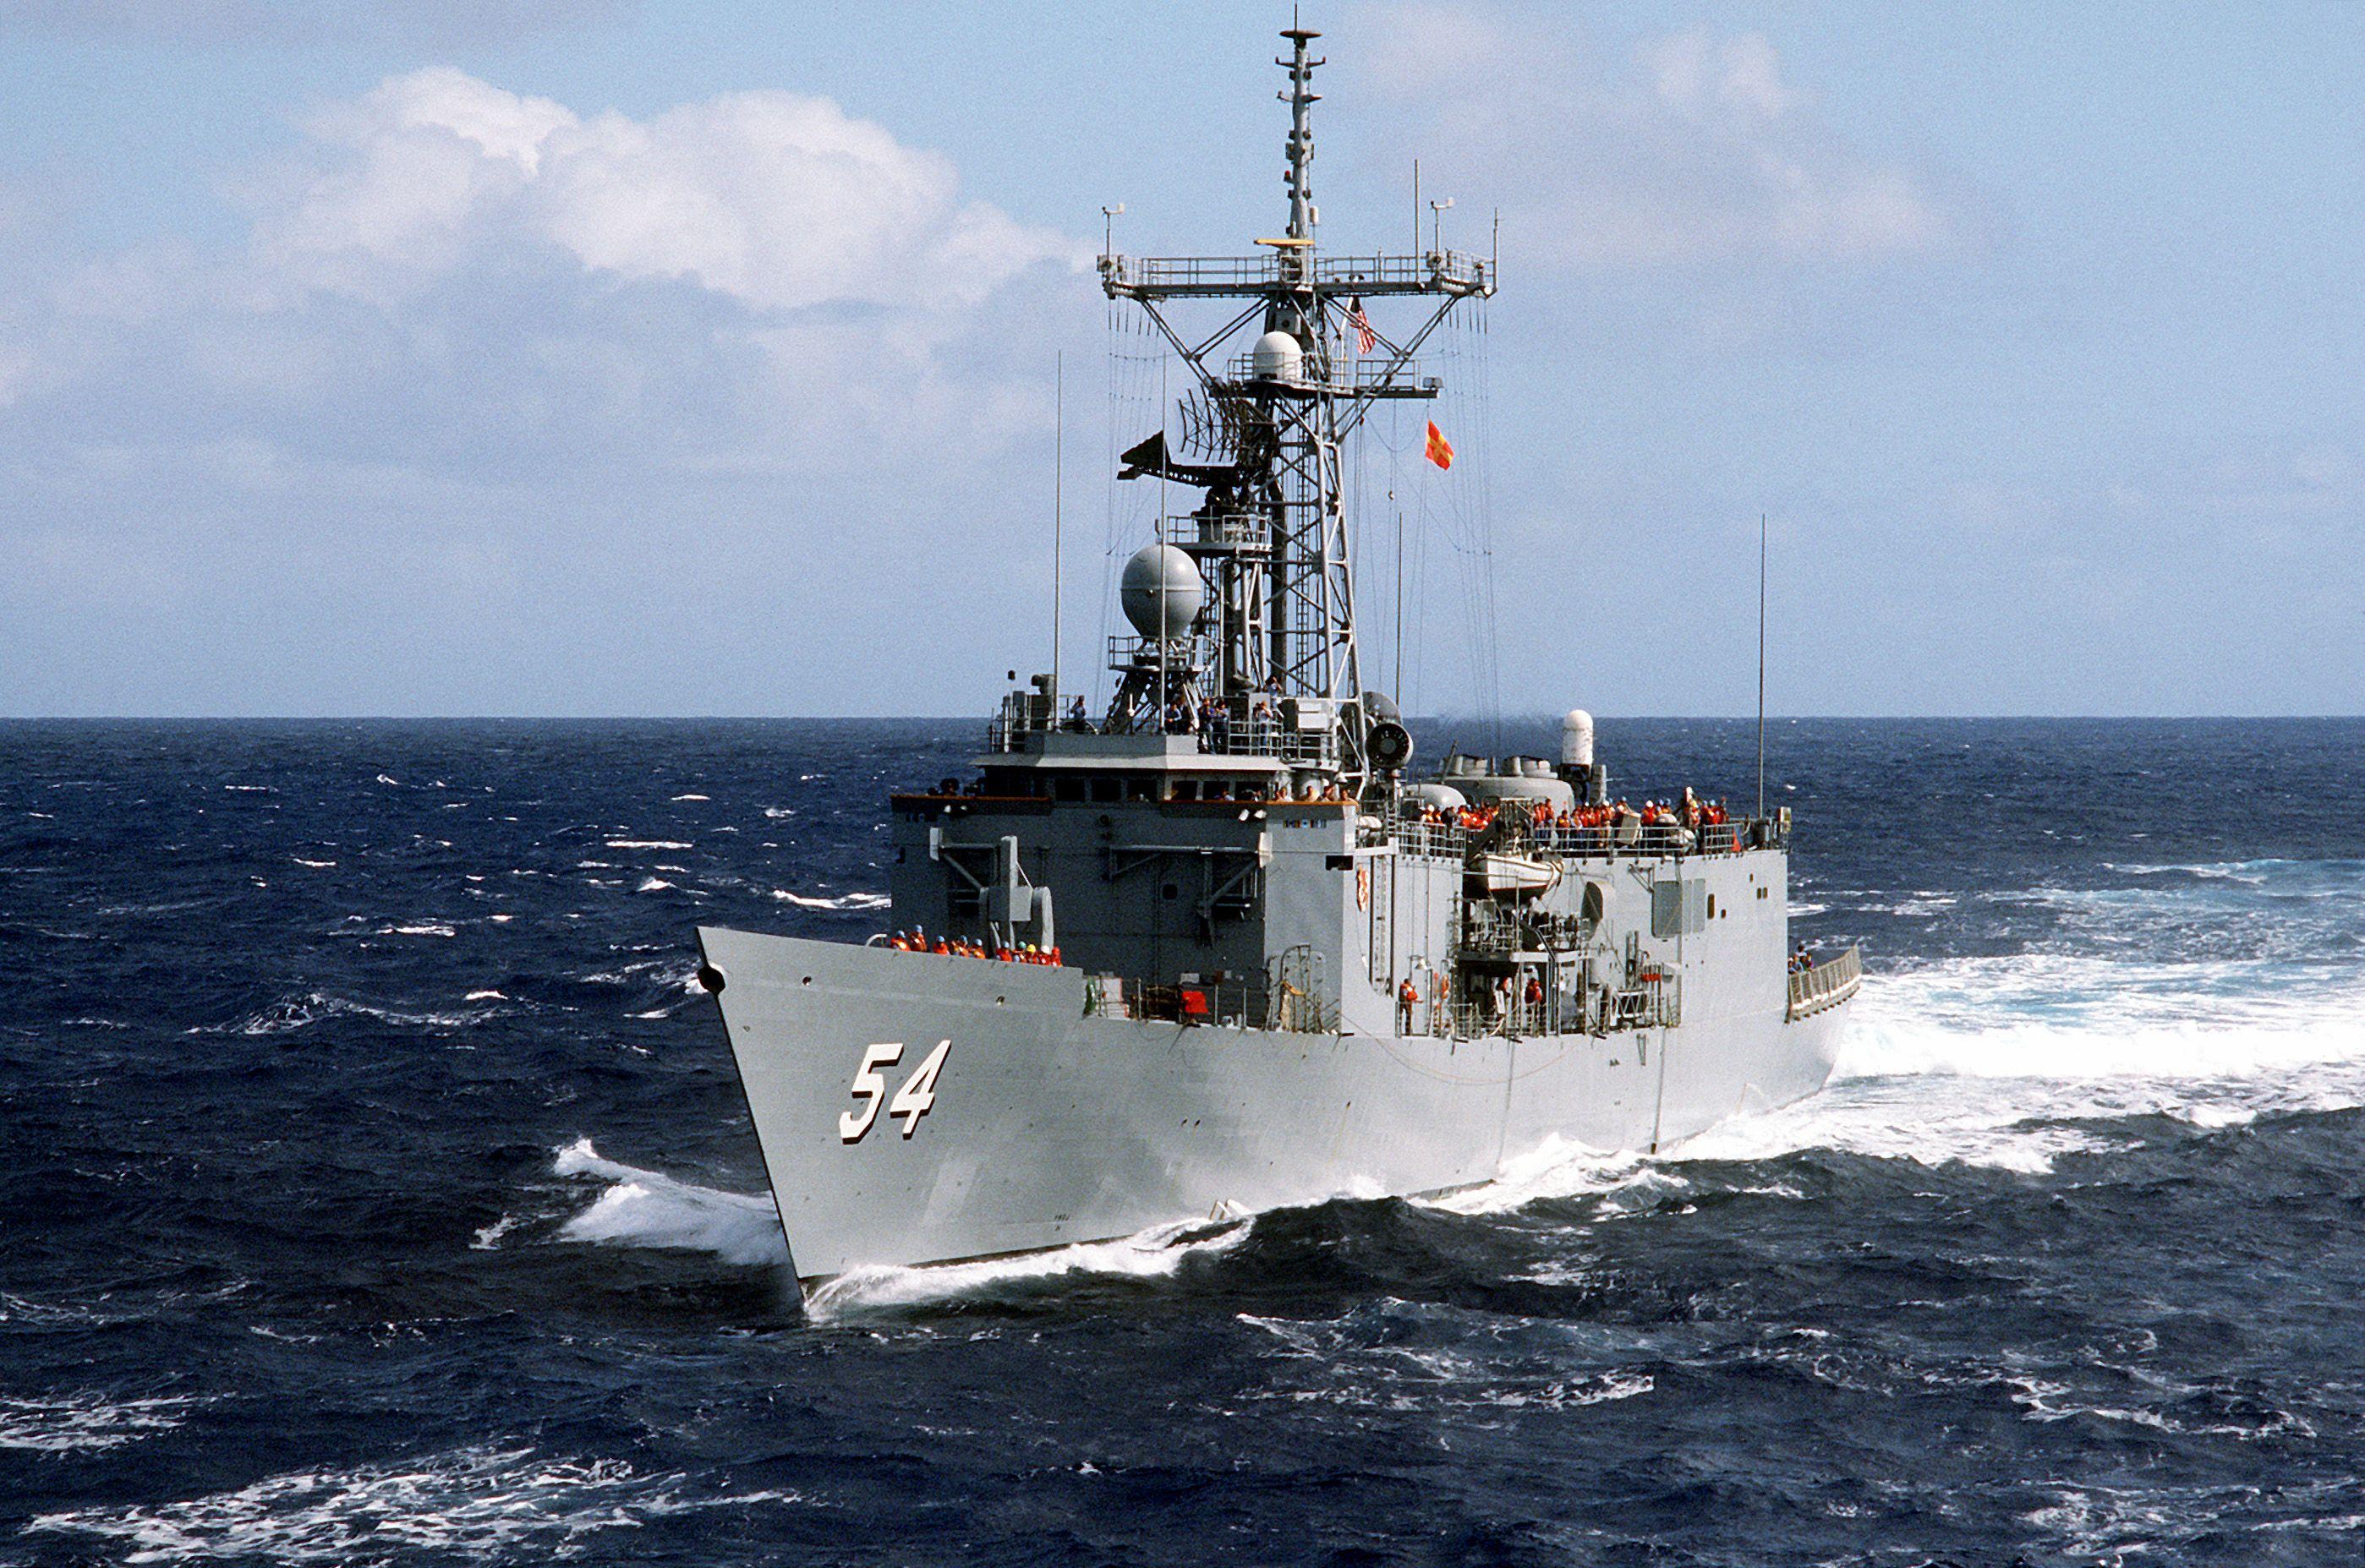 Oliver Hazard Perry Class Frigate (USA